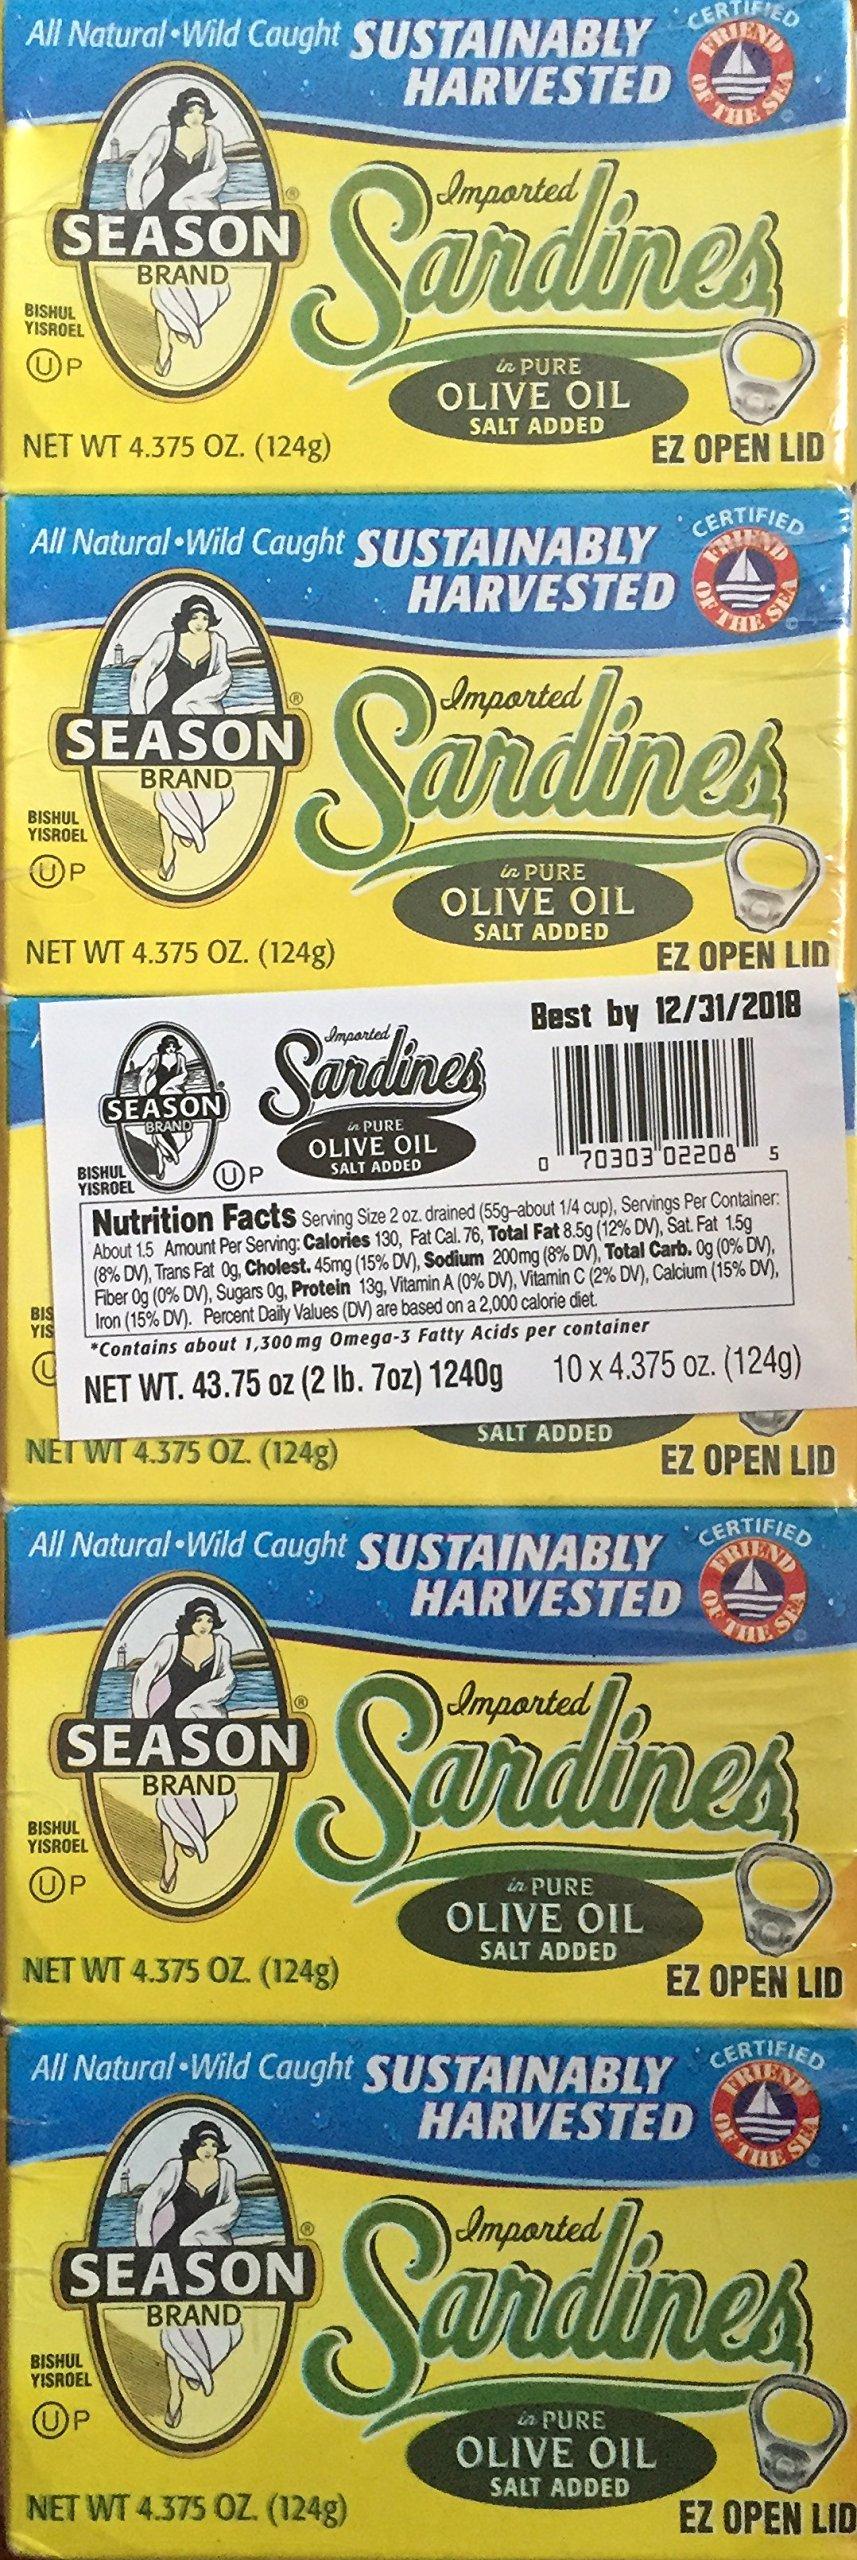 Season Sardines in Pure Olive Oil (Pack of 10) by Season 1